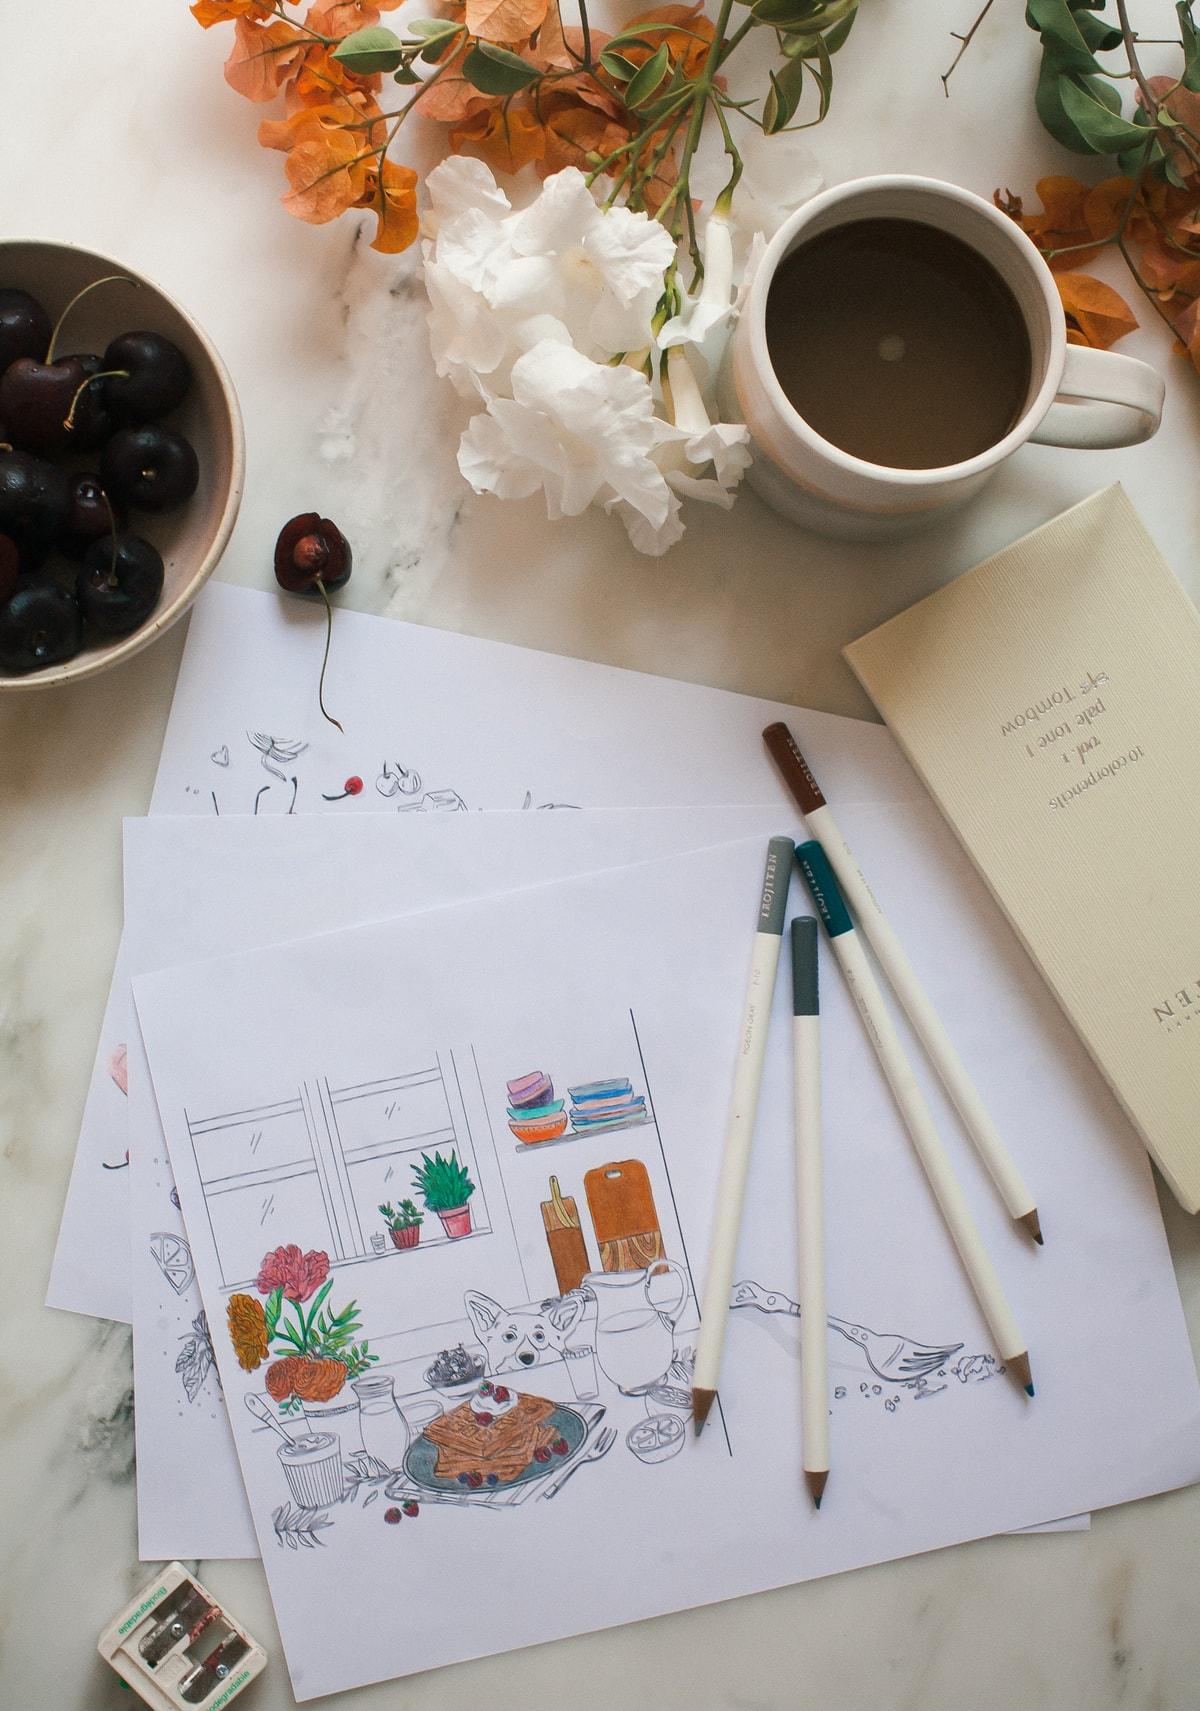 A Cozy Coloring Cookbook Cover